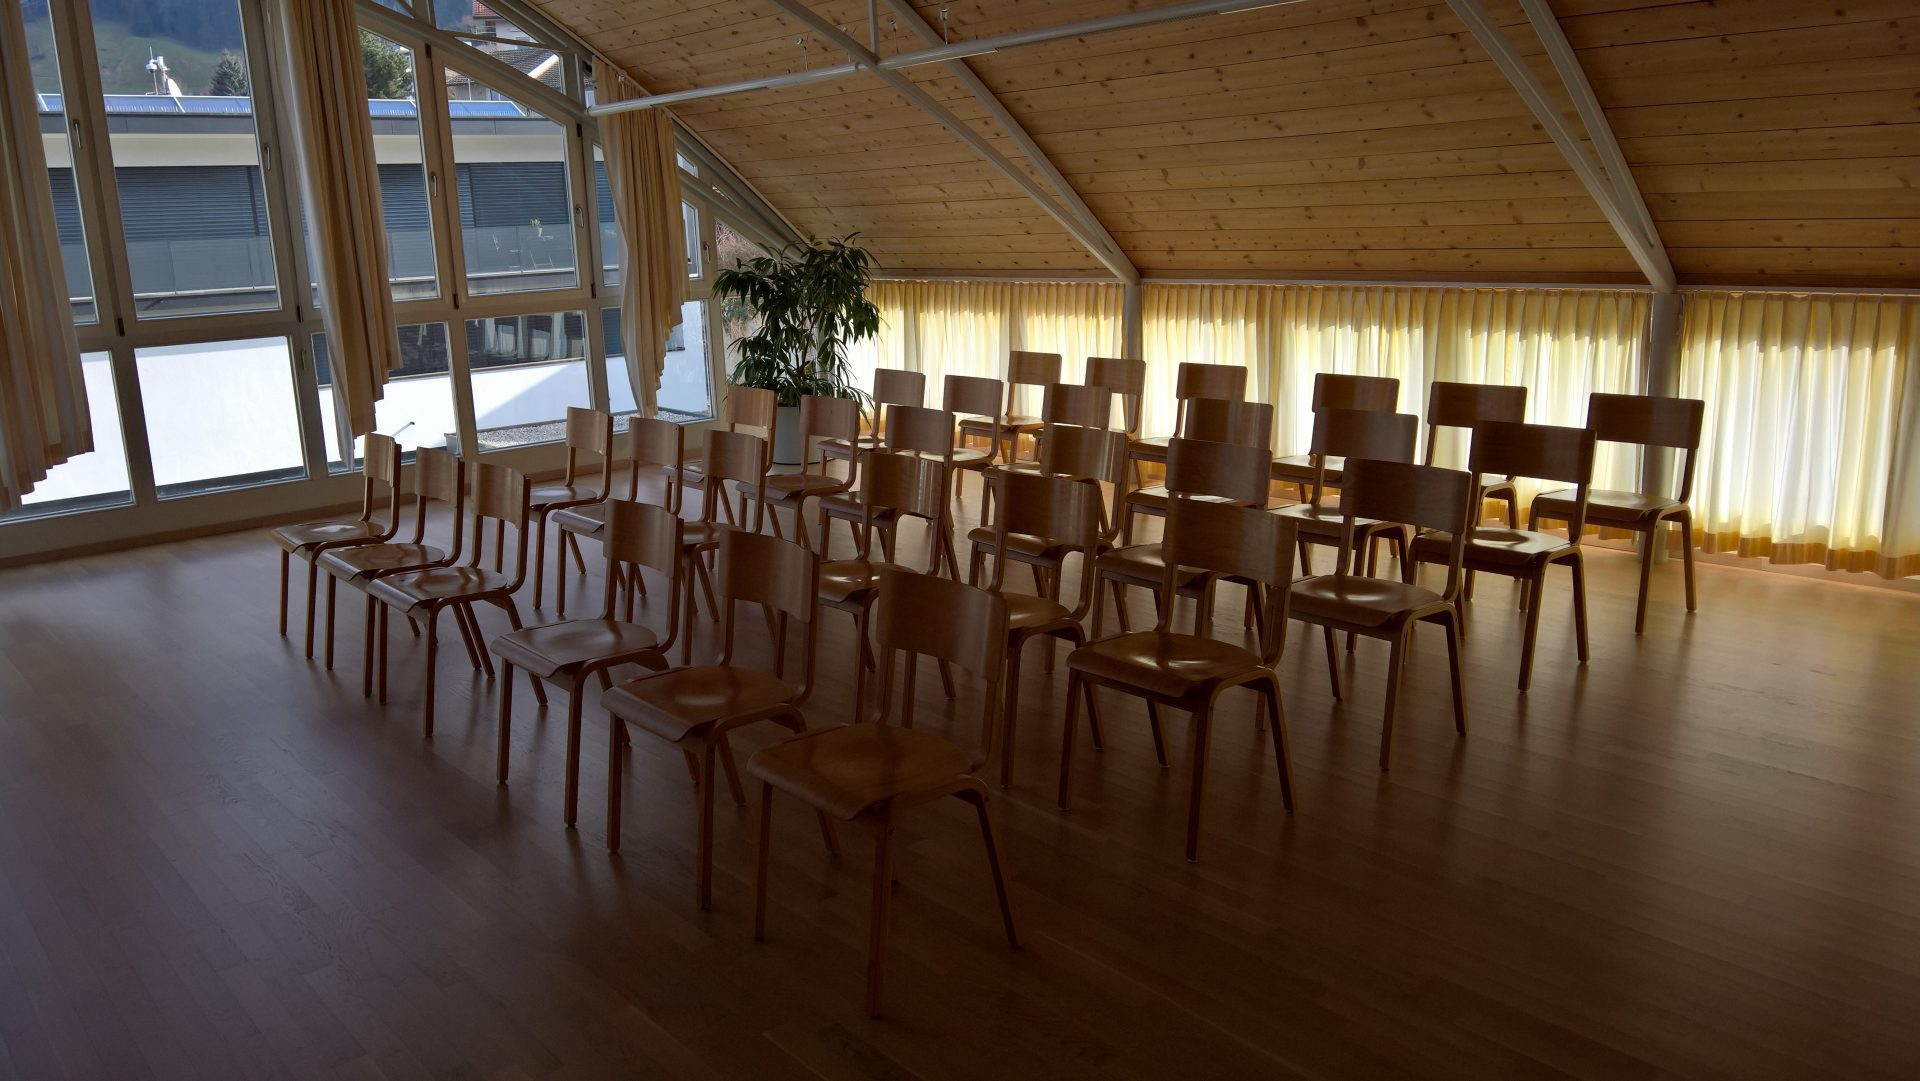 meditationsraum kolping bregenz. Black Bedroom Furniture Sets. Home Design Ideas